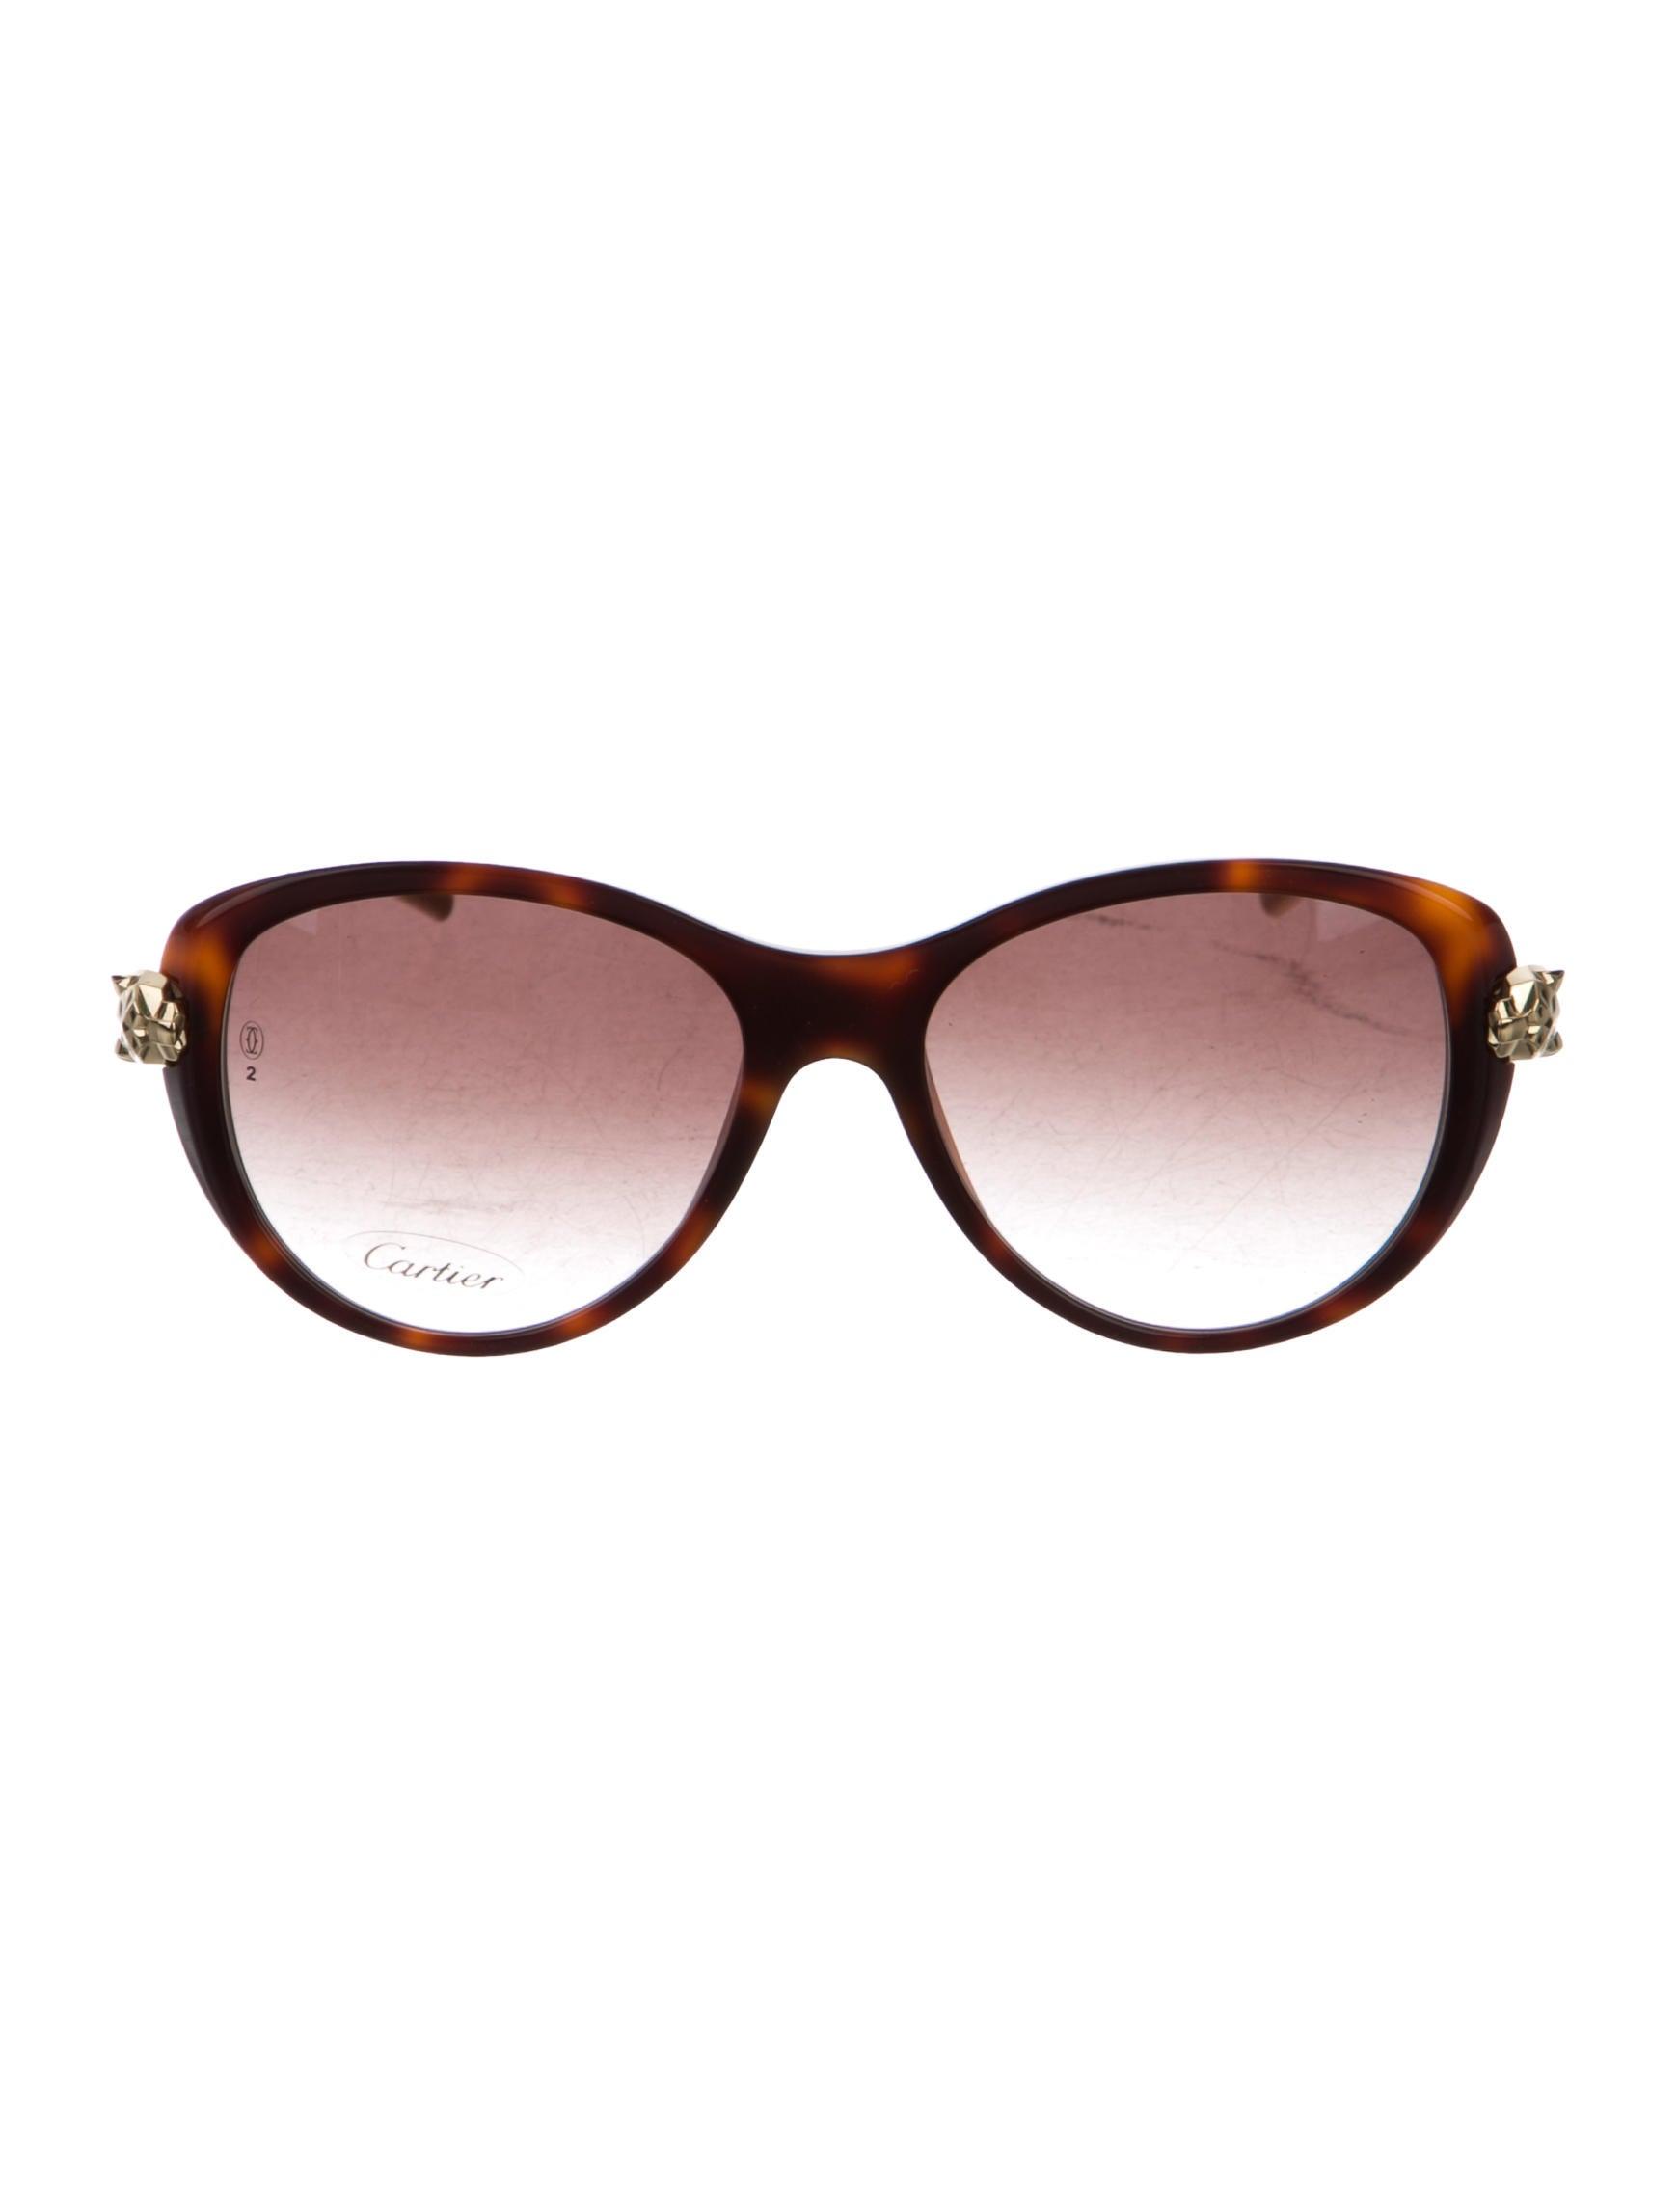 e31c48ce37 Cartier Panthère Wild Cat Sunglasses w  Tags - Accessories ...